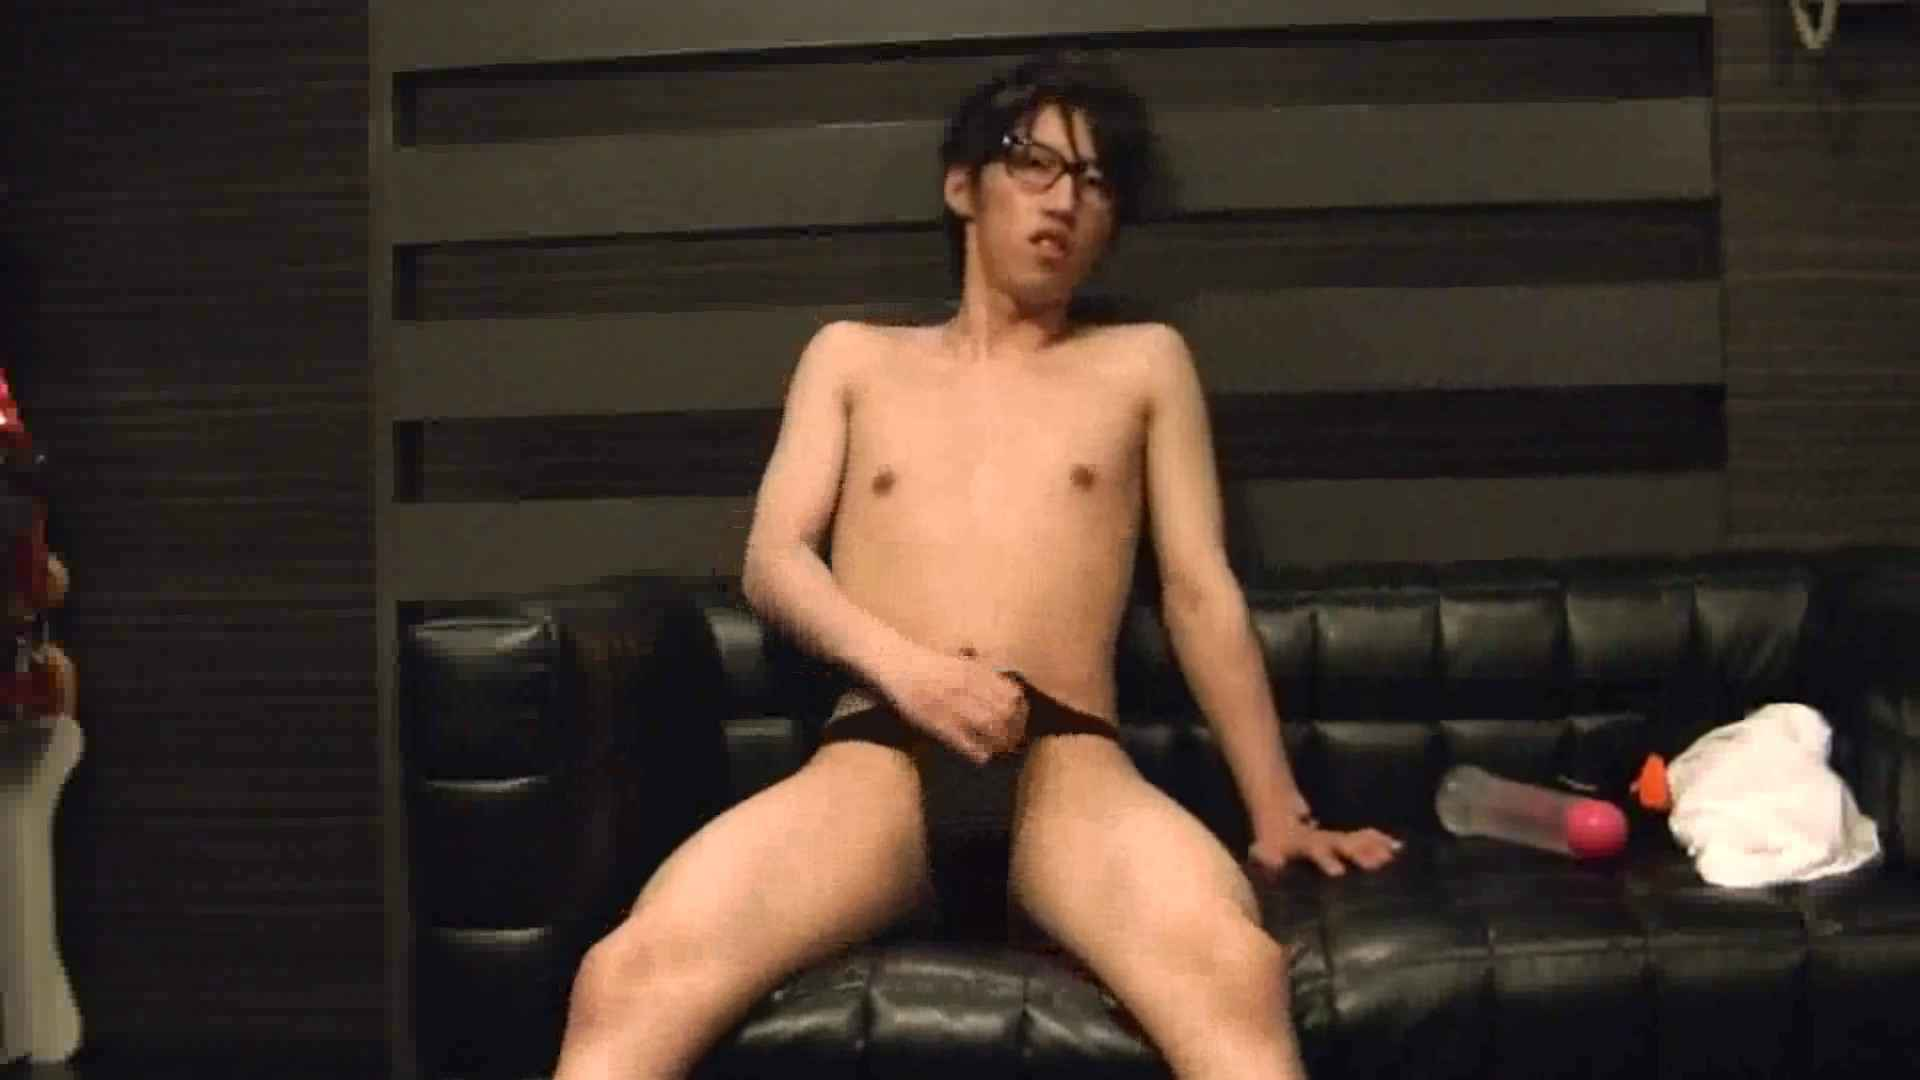 ONA見せカーニバル!! Vol3 男まつり ゲイ無料無修正画像 87枚 52